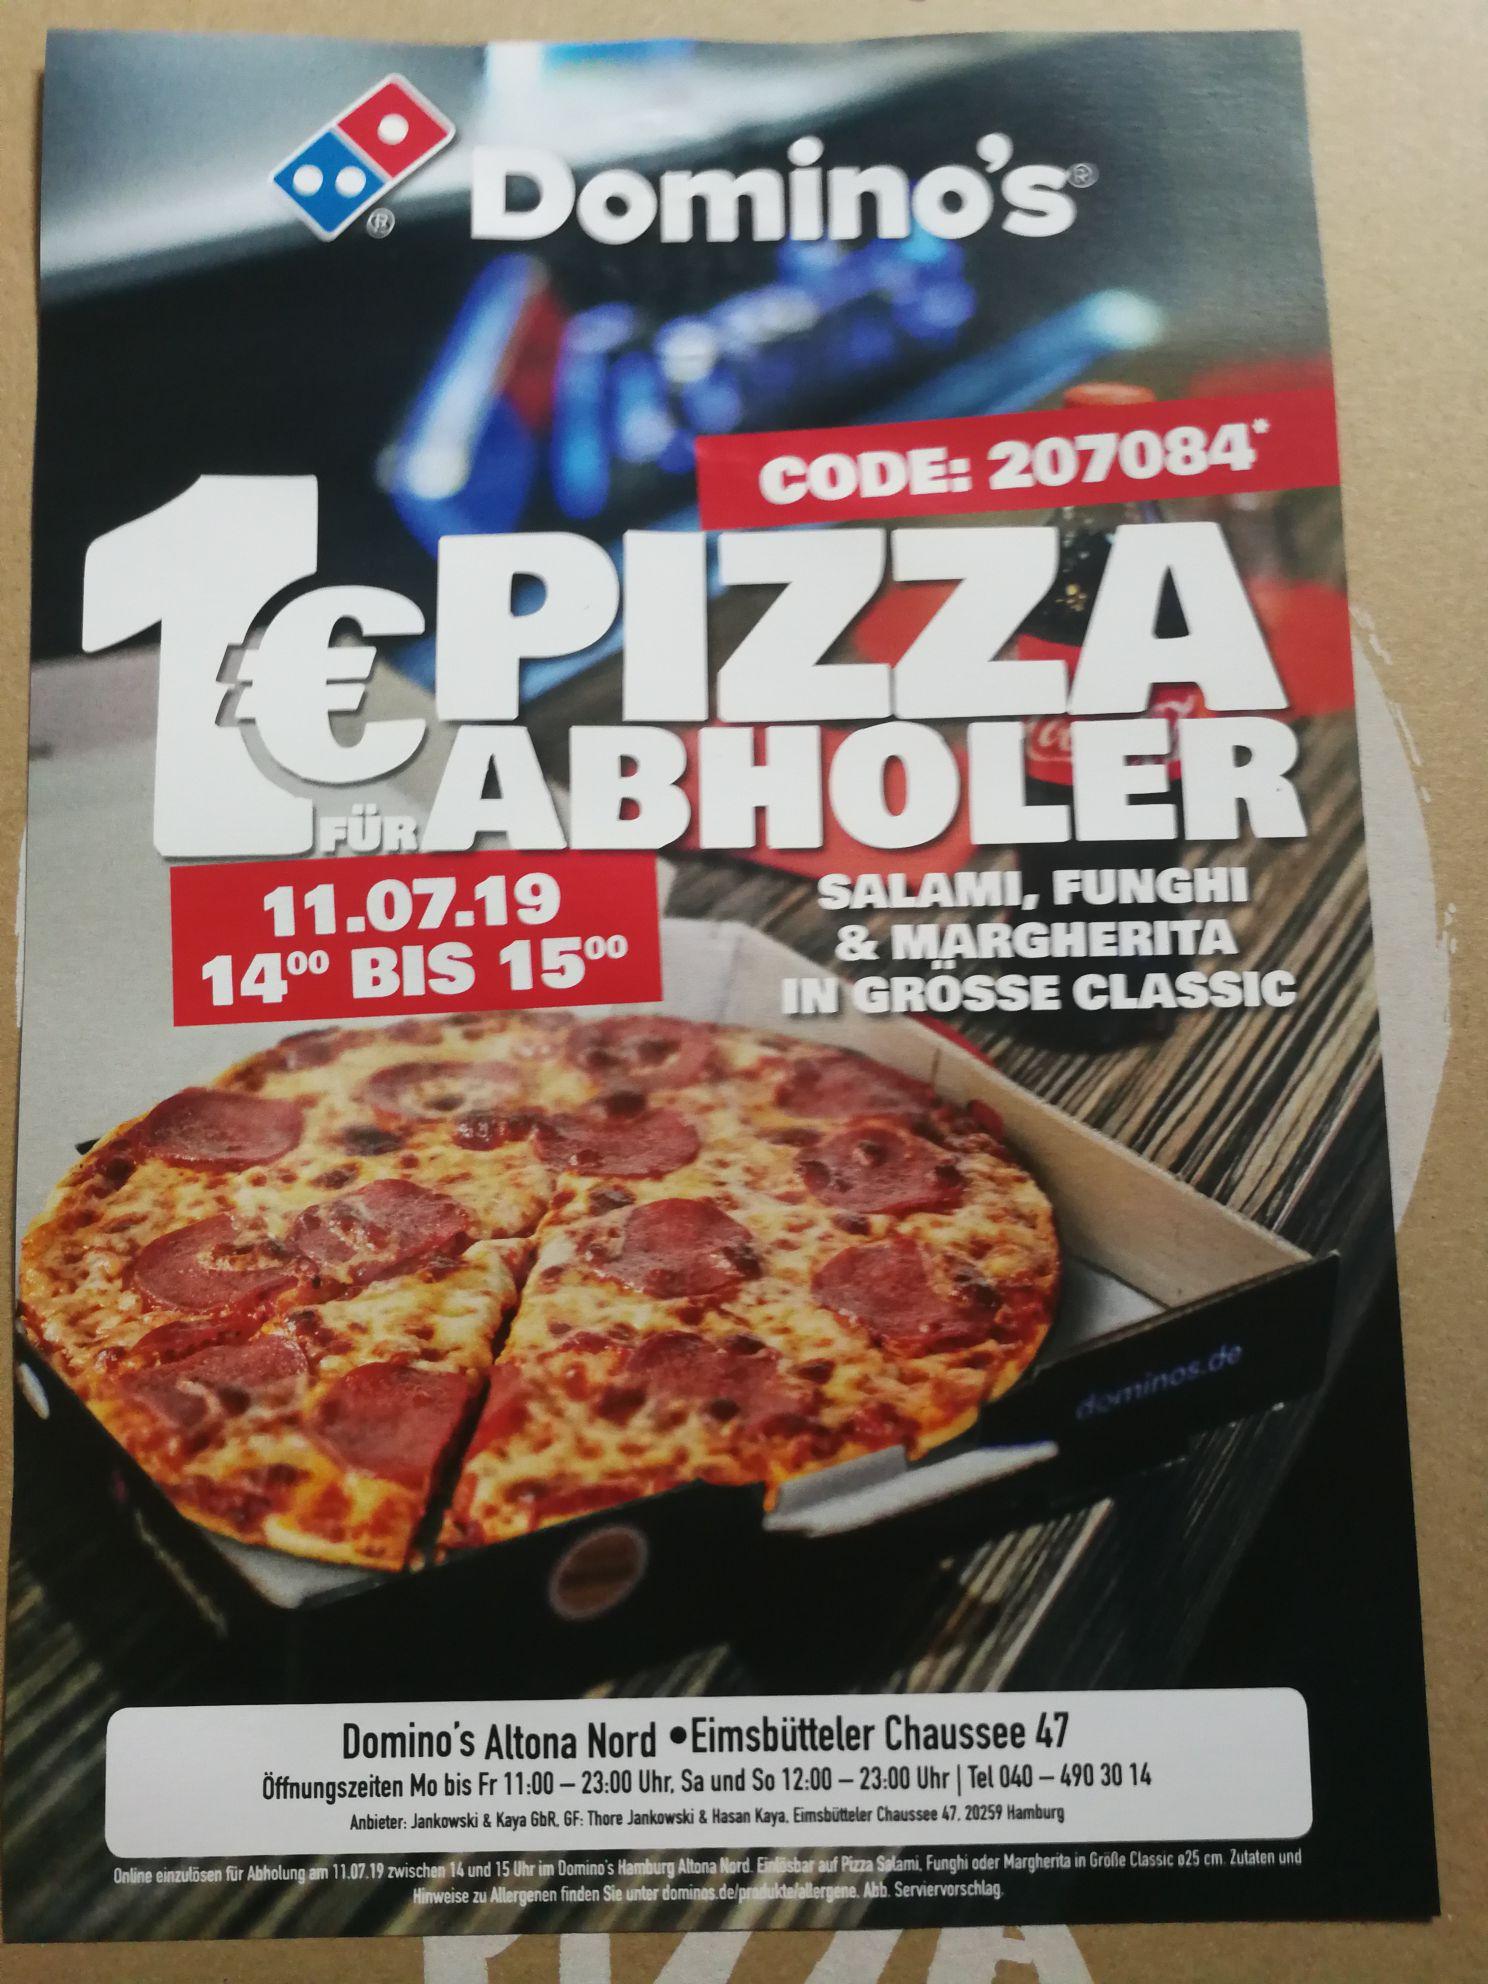 Pizza Klassiker für 1,- Euro bei Abholung - 11.07. lokal Hamburg-Altona